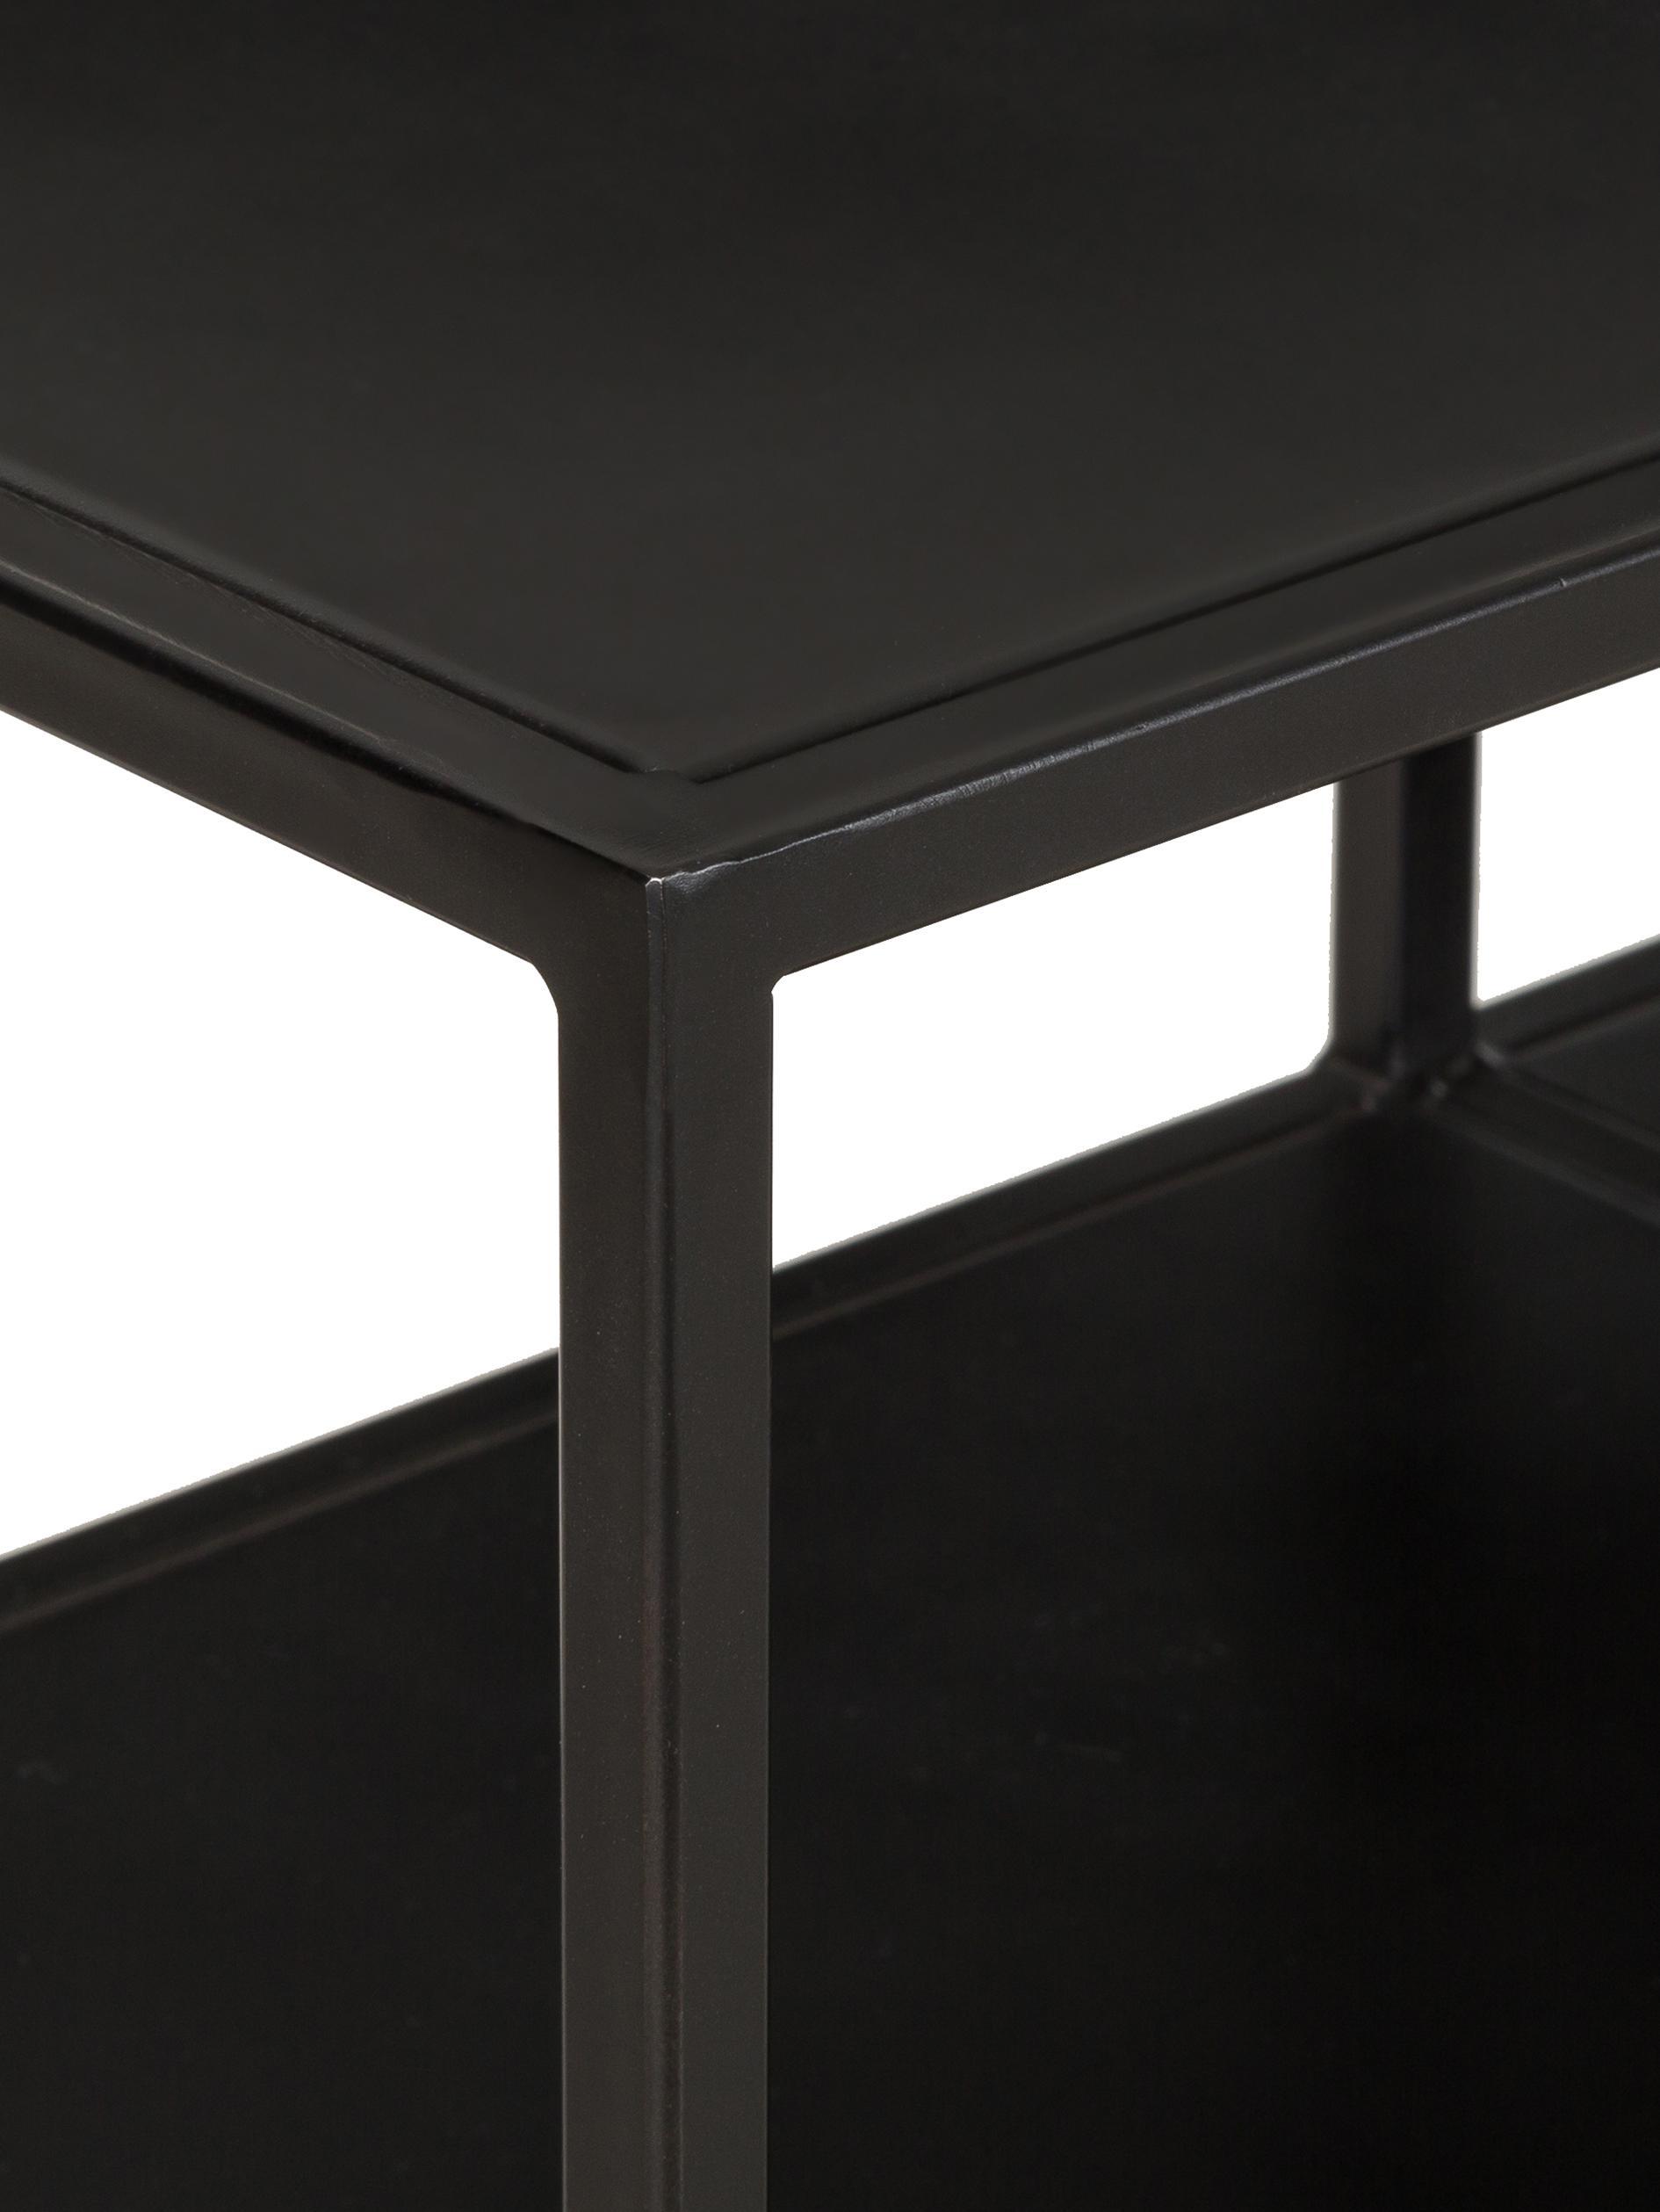 Metall-Standregal Display in Schwarz, Metall, pulverbeschichtet, Schwarz, 130 x 74 cm